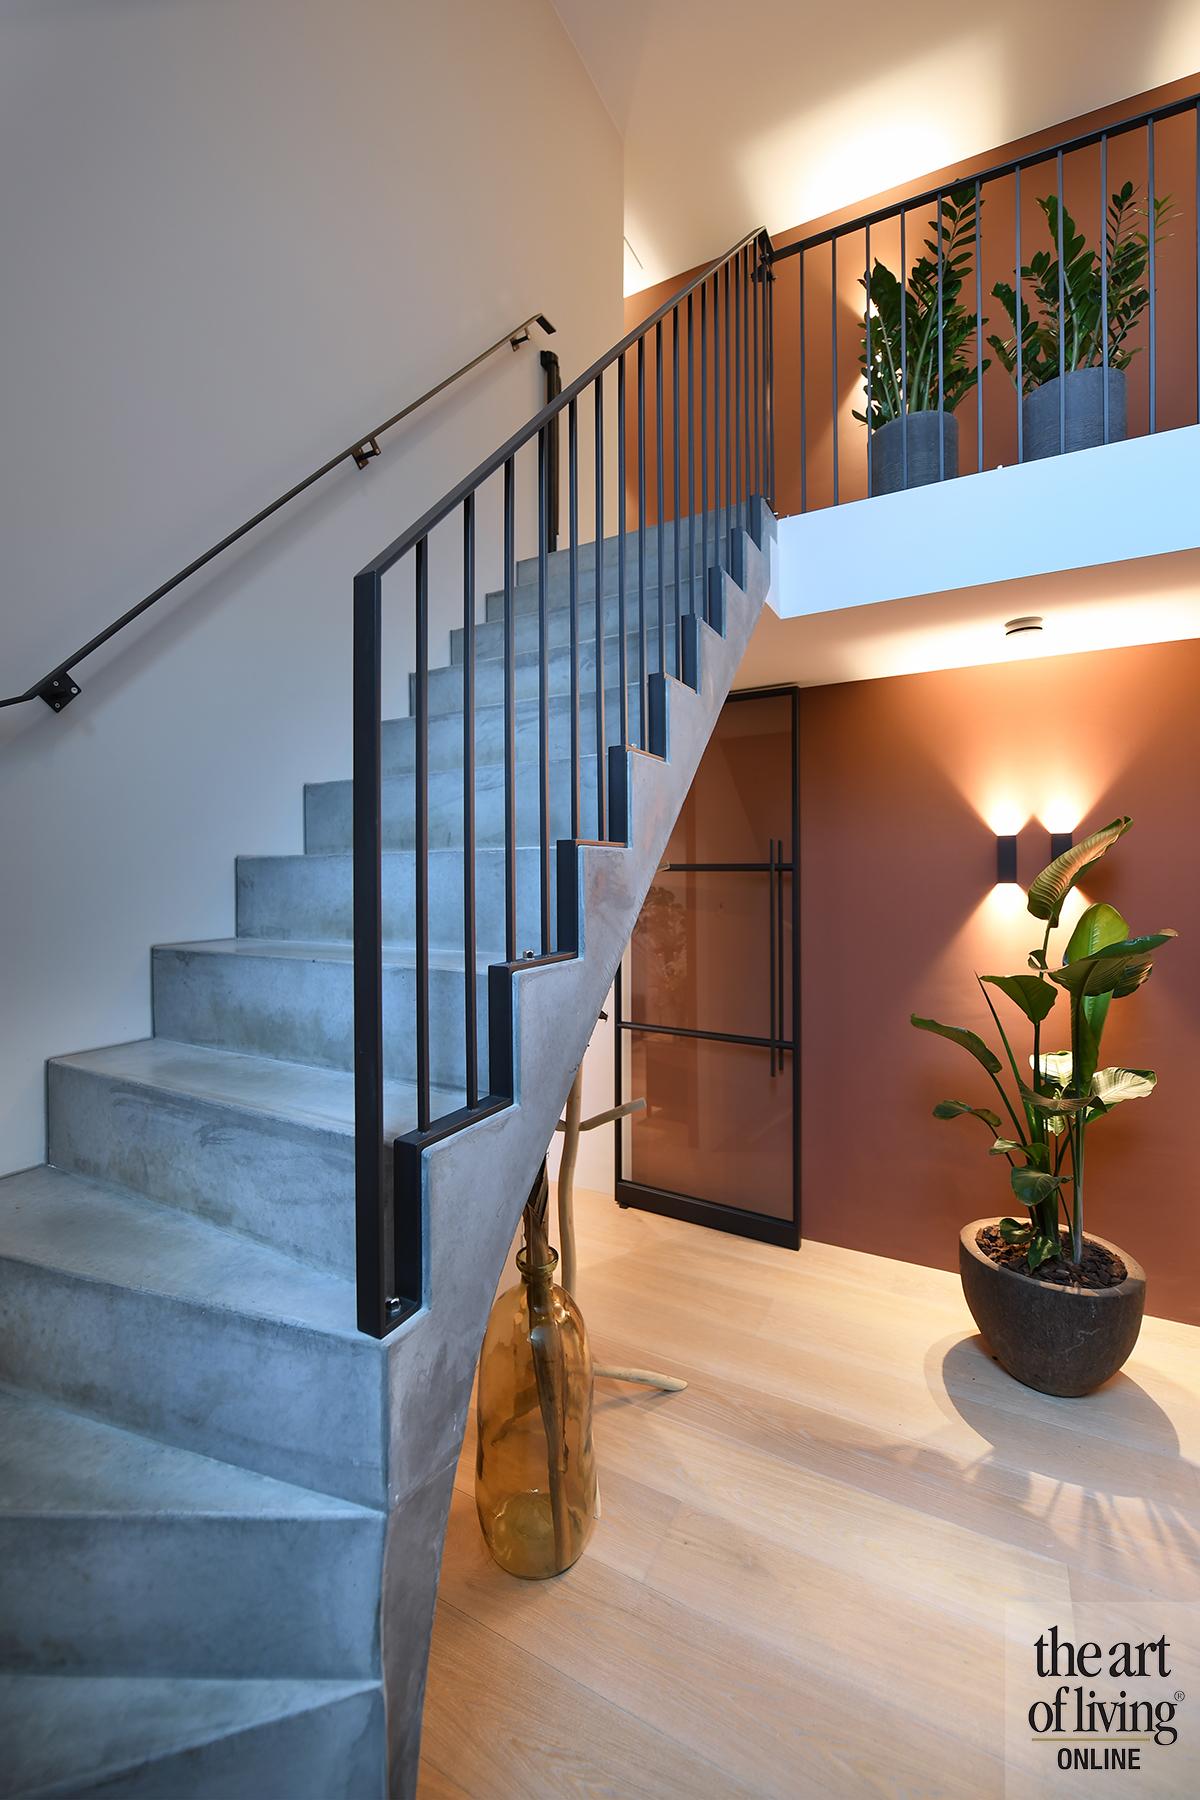 Symmetrische Architectuur, Van Houtum, the art of living